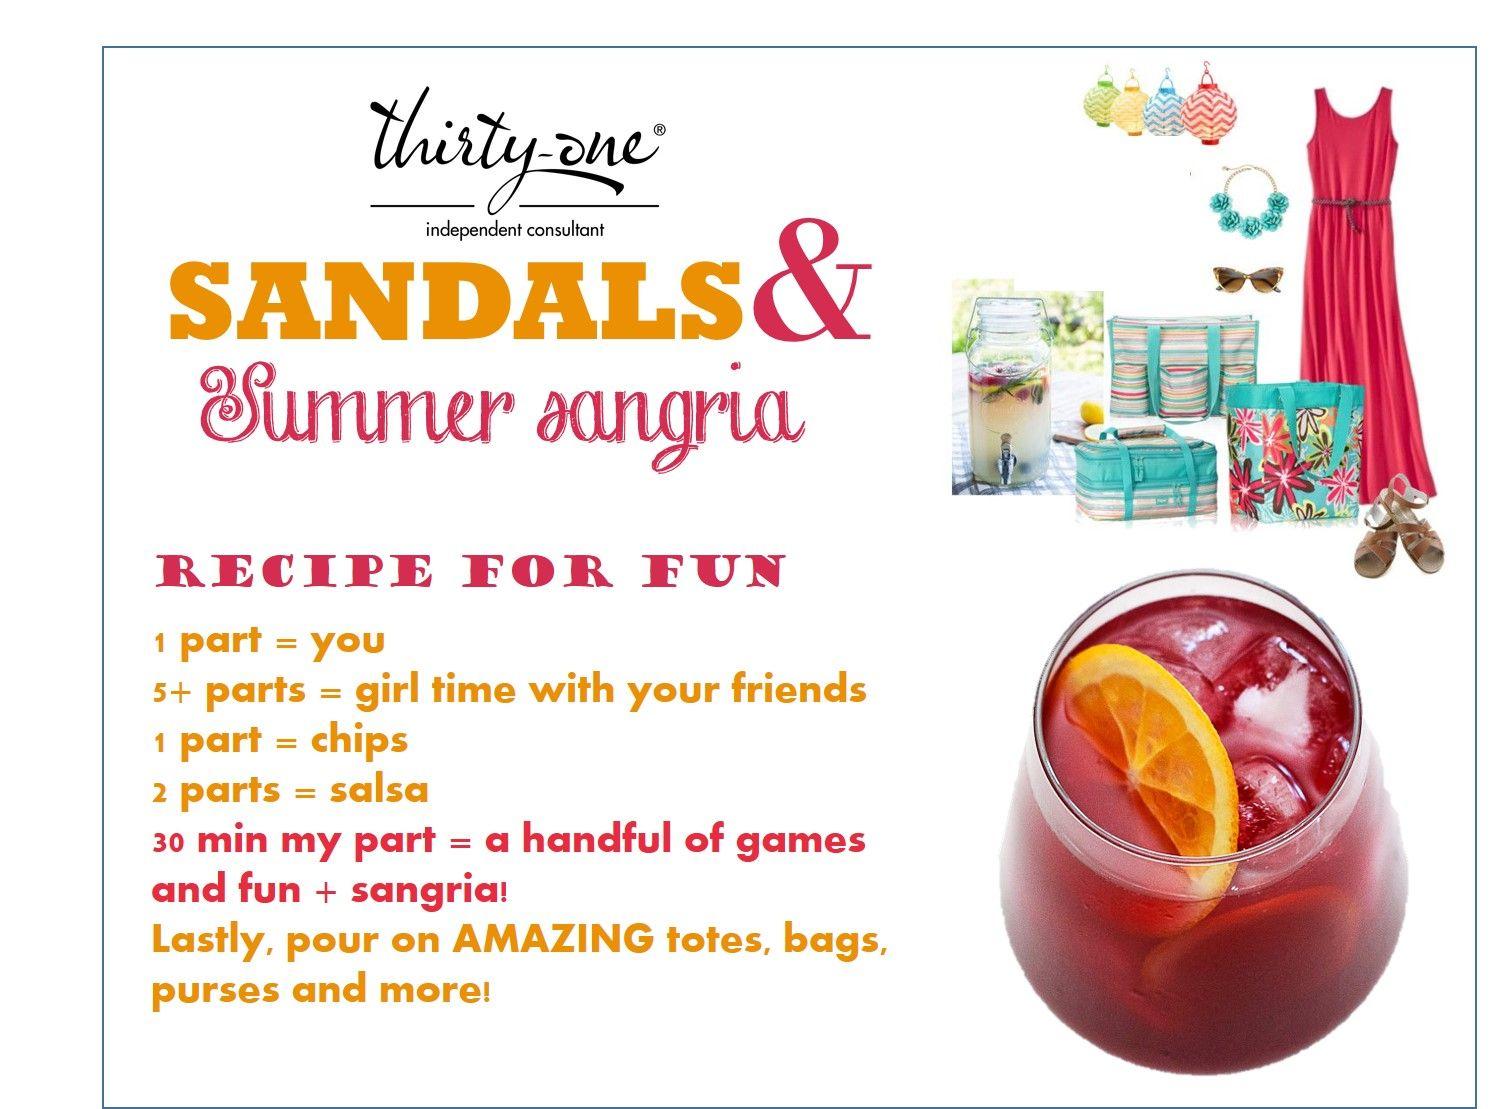 sandals sangria party invite www.mythirtyone.com/apeterson86 ...